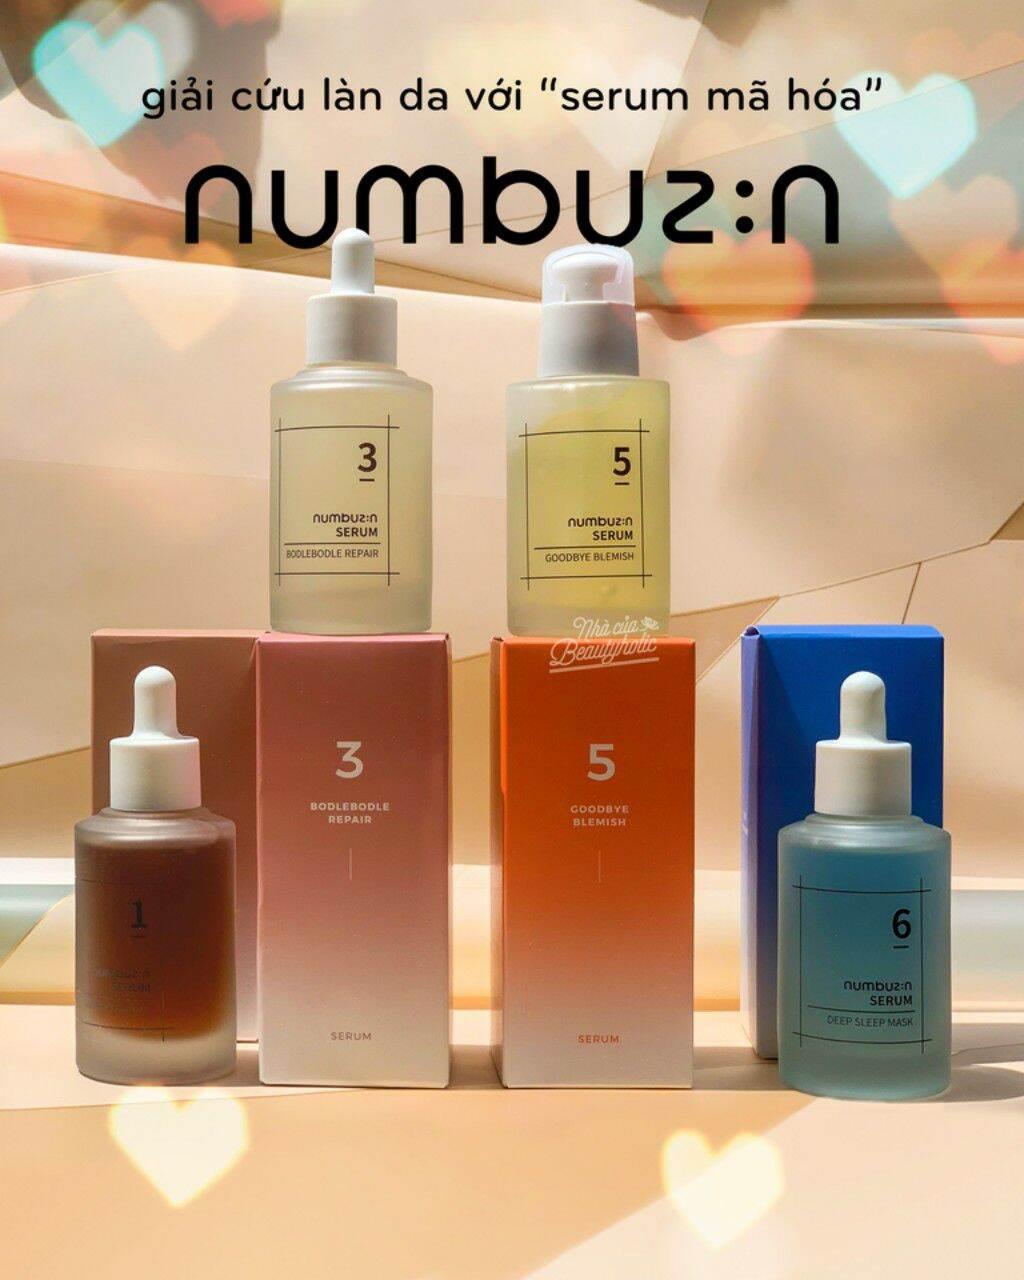 [HCM][Nhacuabeautyholic] Serum dưỡng da NUMBUZ:N ( NUMBUZIN)